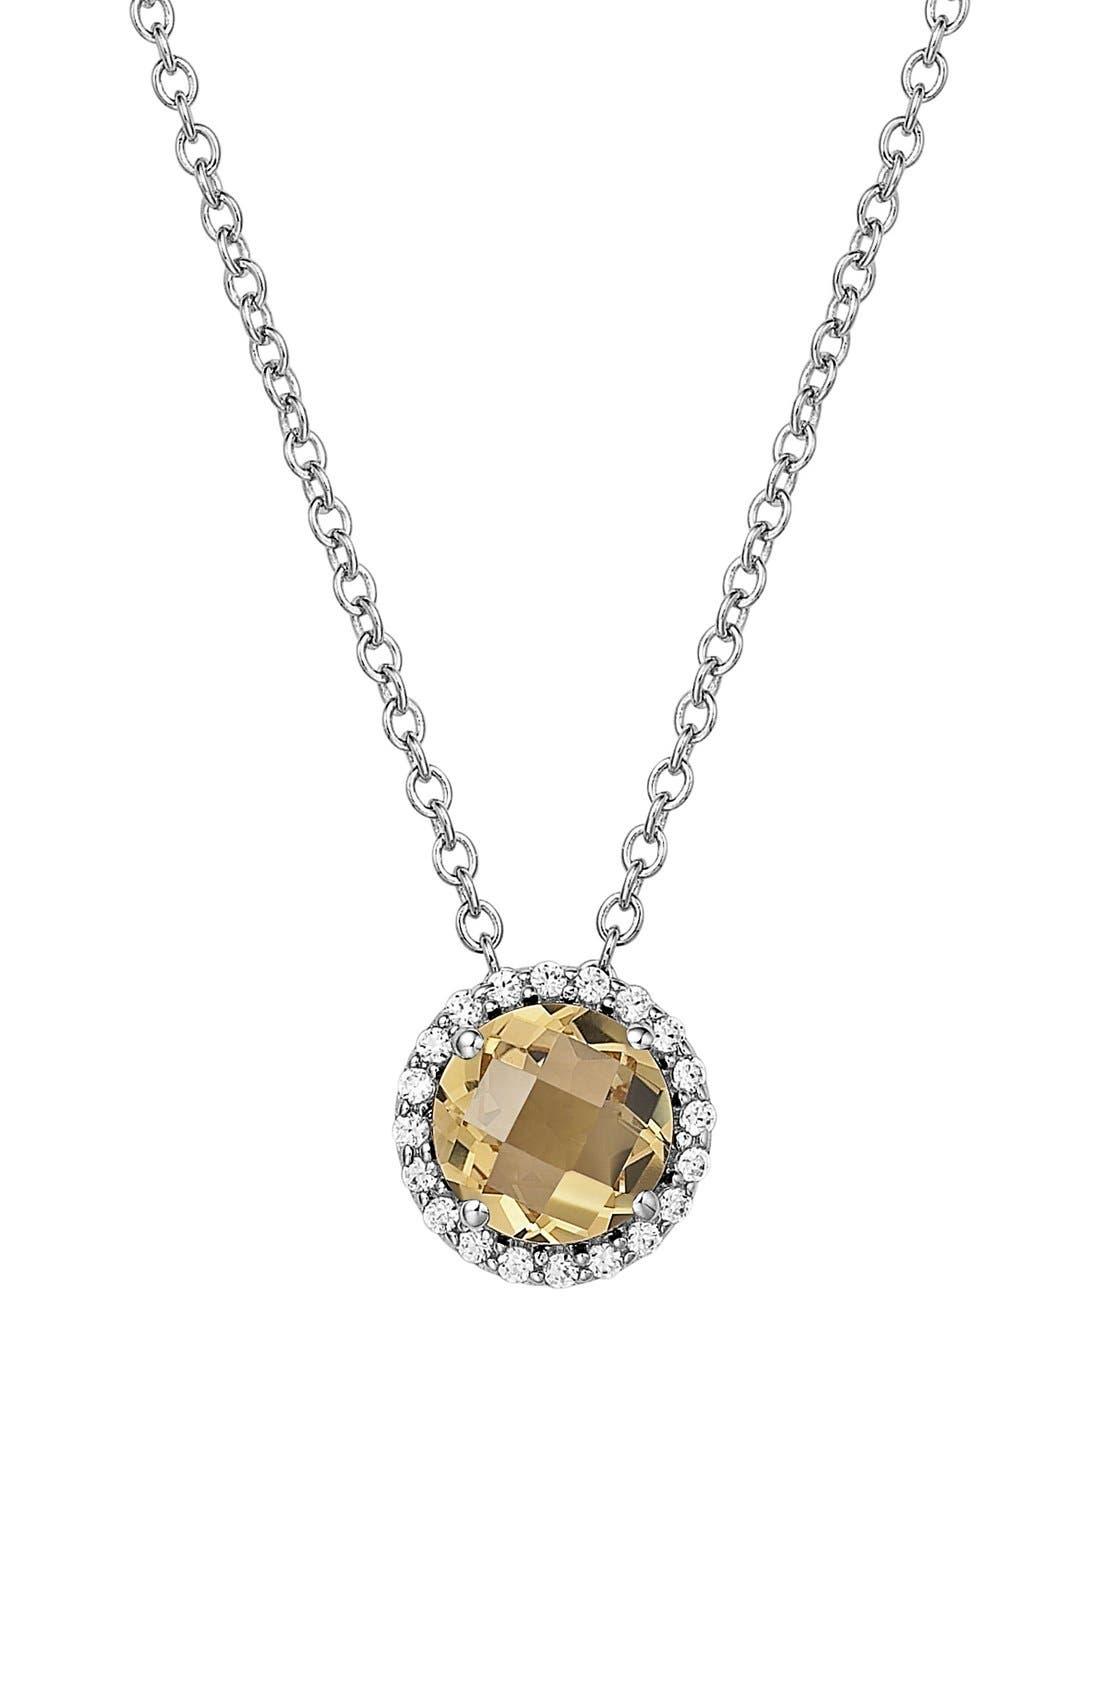 Birthstone Halo Pendant Necklace,                         Main,                         color, November Citrine / Silver